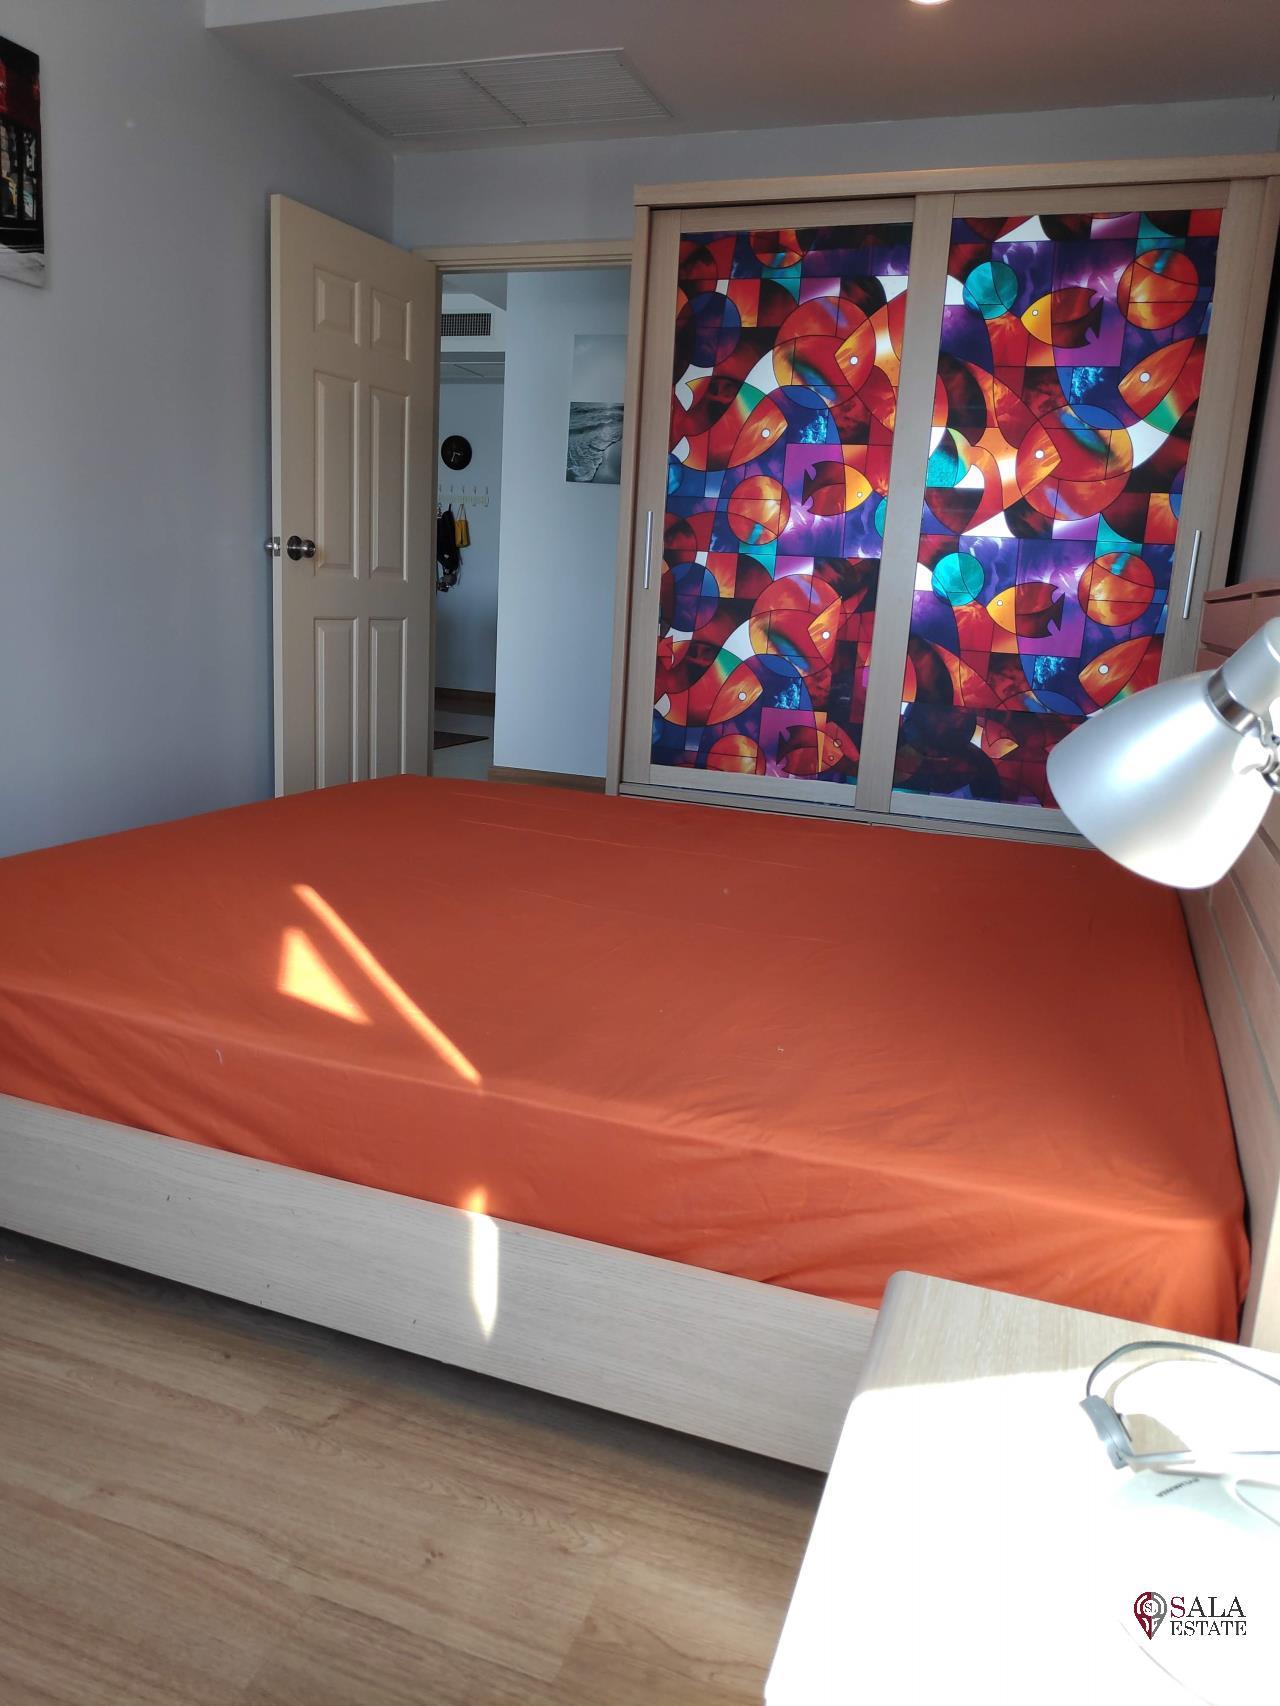 SALA ESTATE Agency's SUPALAI PREMIER NARATHIWAS – BTS CHONG NONSI, 1 BEDROOM 1 BATHROOM, FULLY FERNISHED, CITY VIEW 7